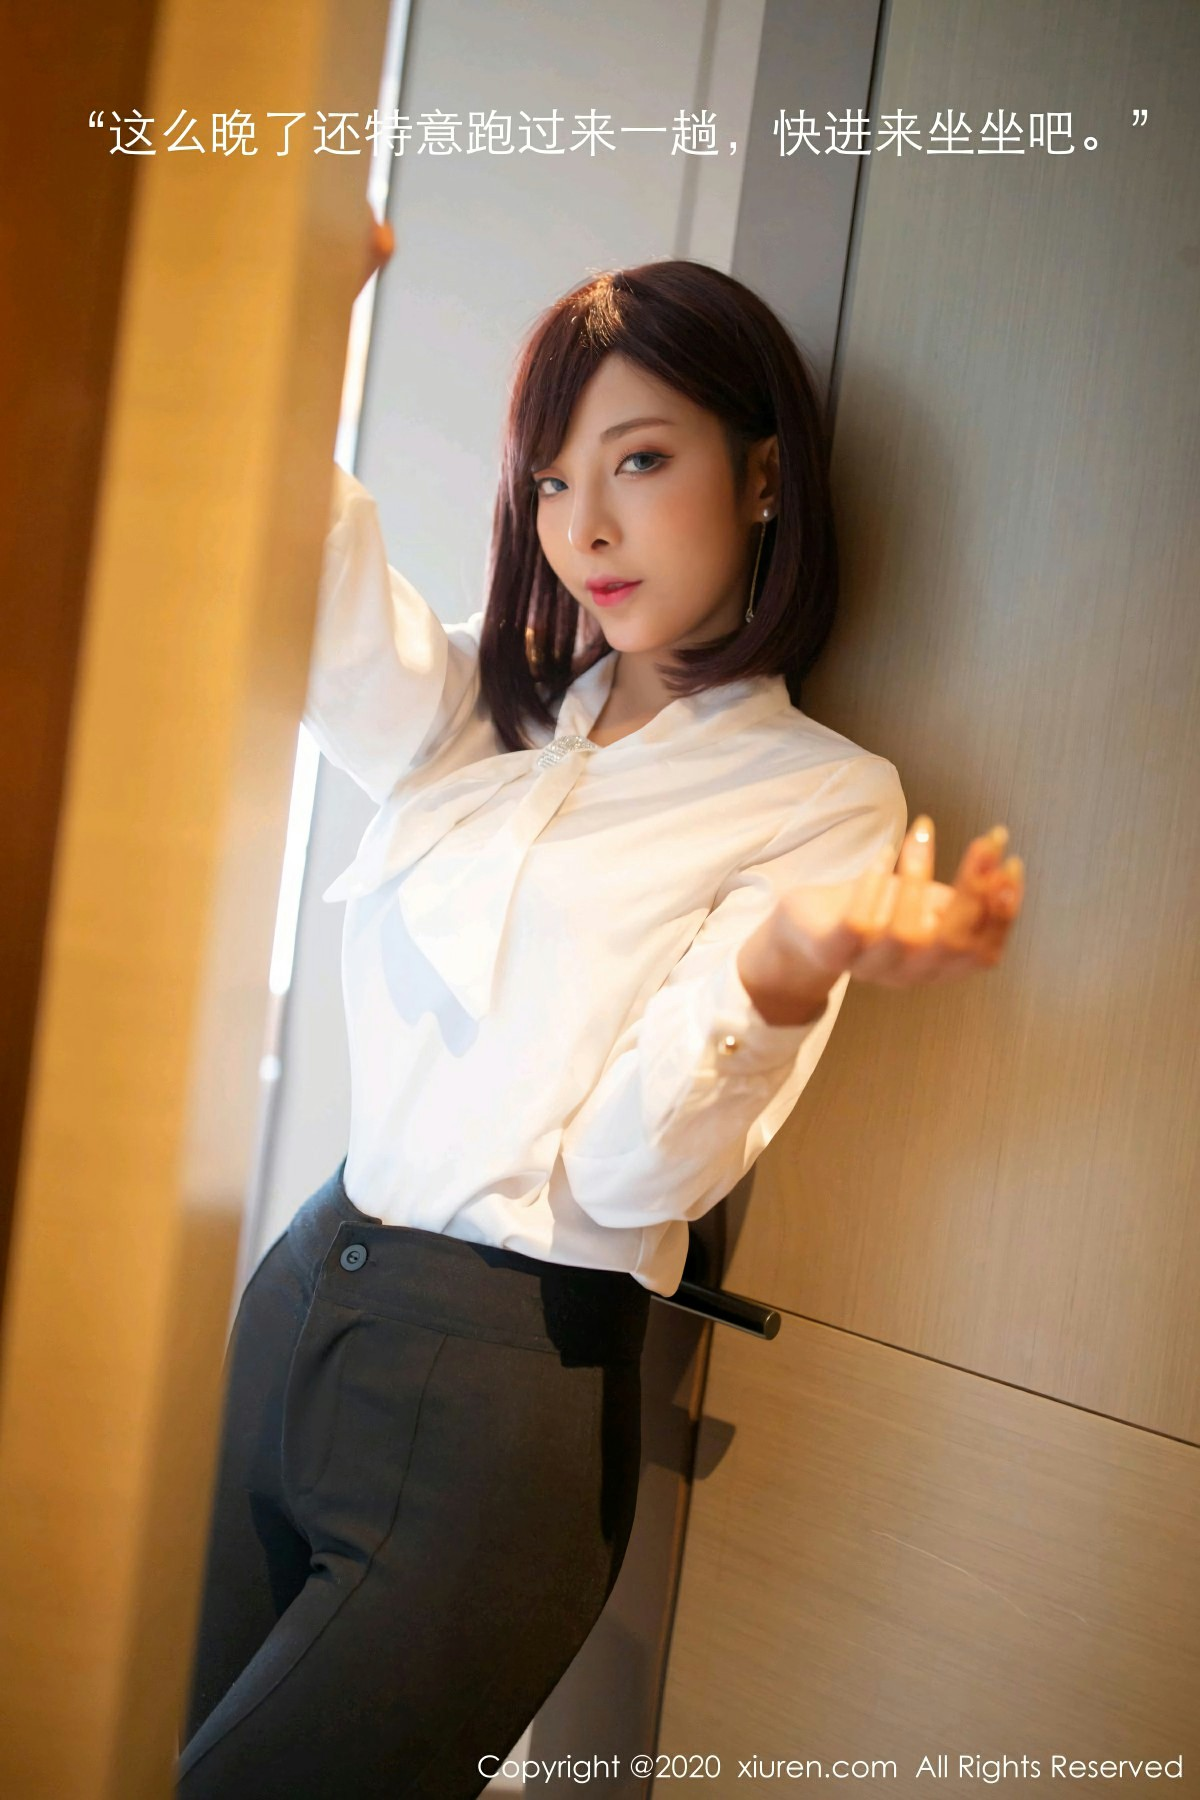 [XiuRen秀人网] 2020.09.07 No.2534 陈小喵 特别福利 第4张